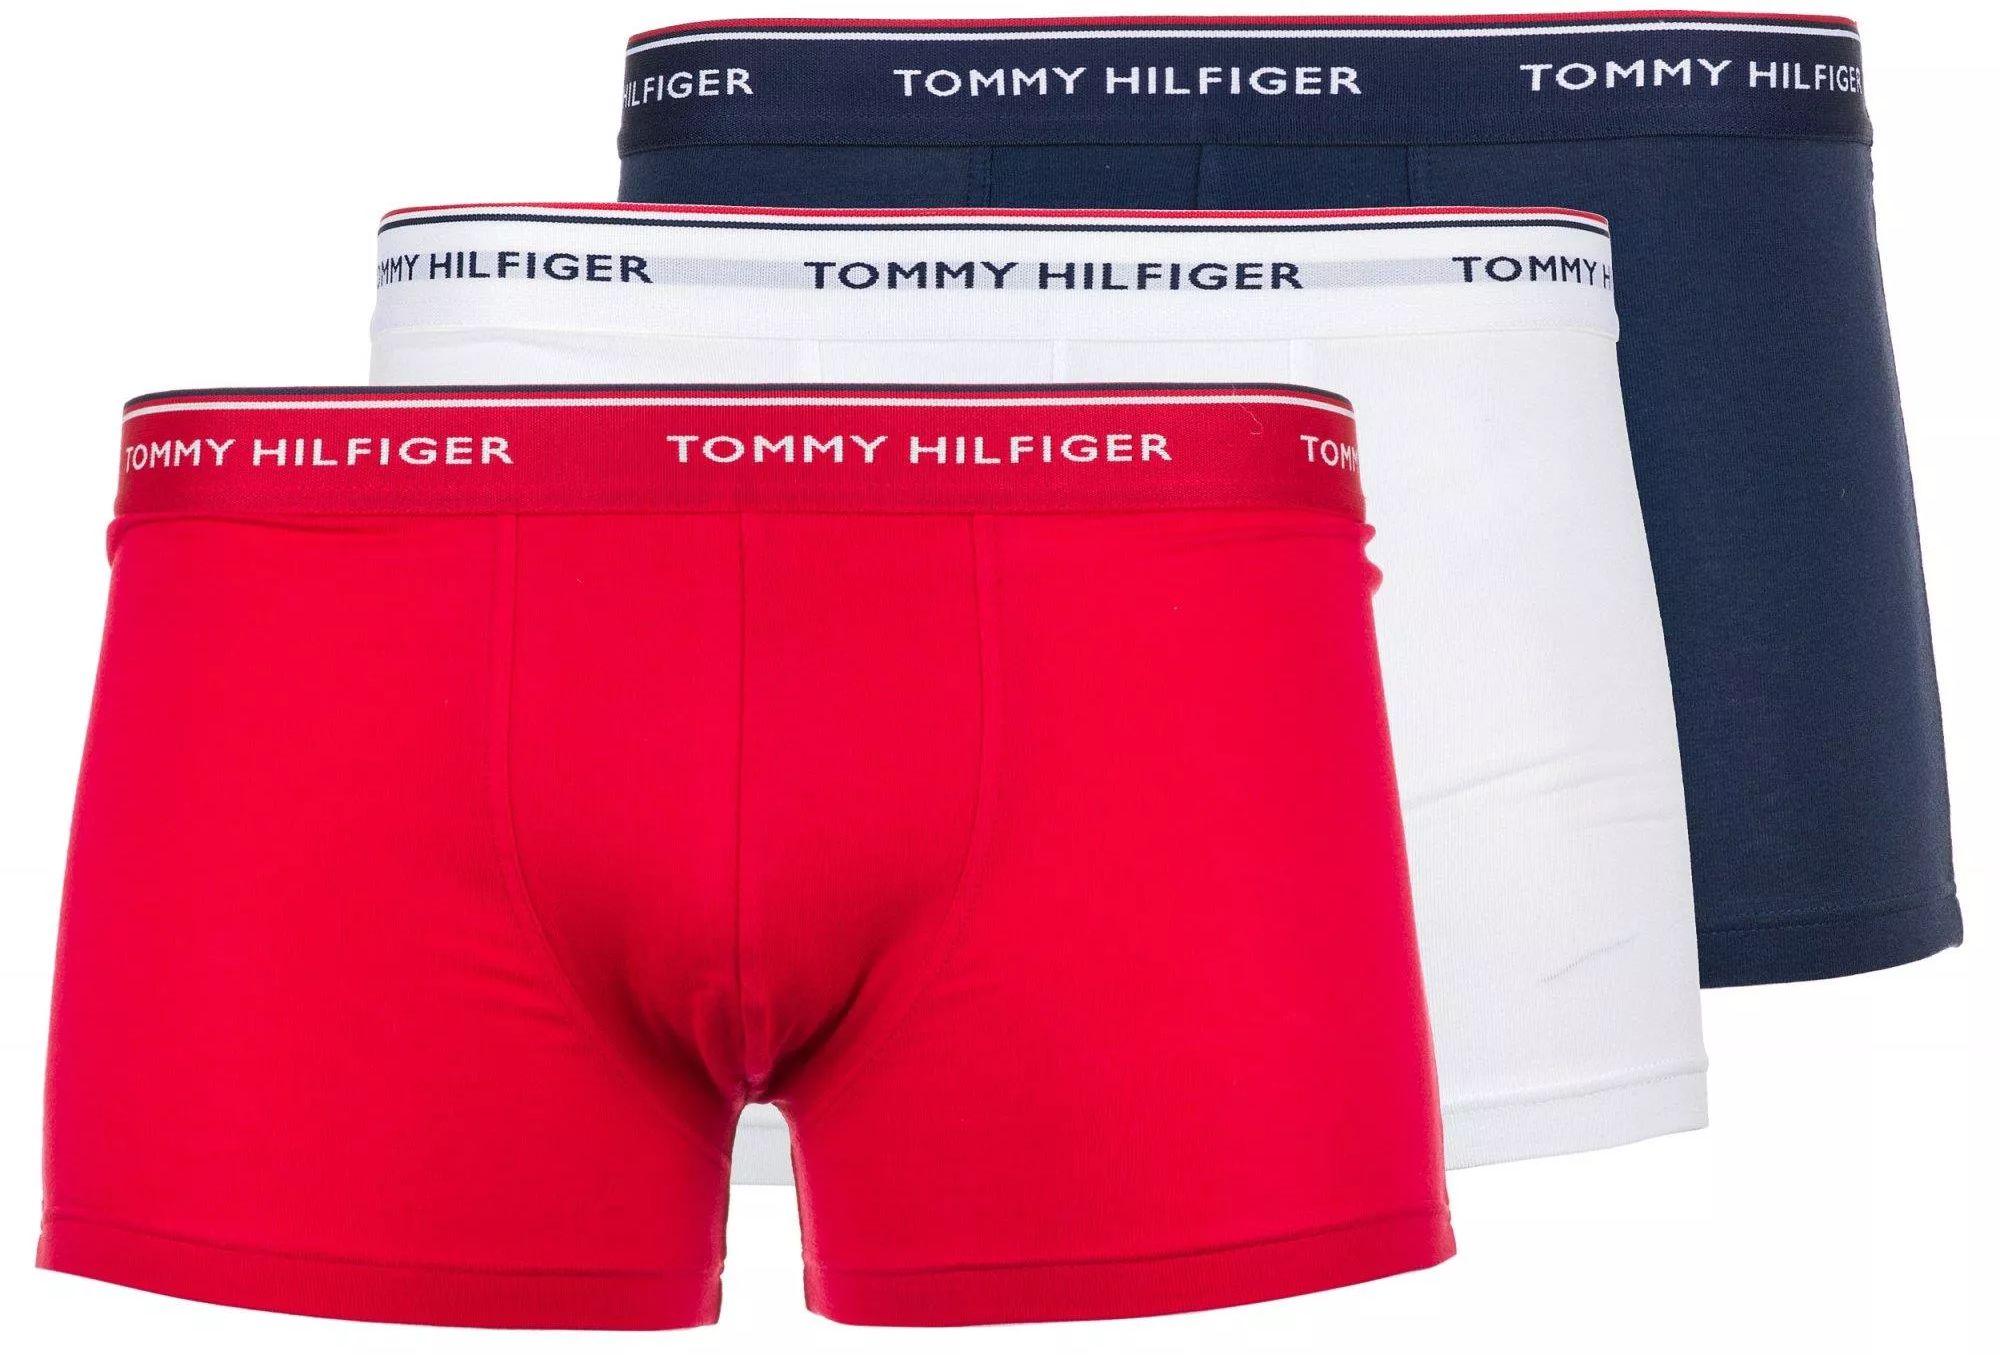 Bokserki Underwear Tommy Hilfiger 3-Pack Białe Granatowe Czerwone